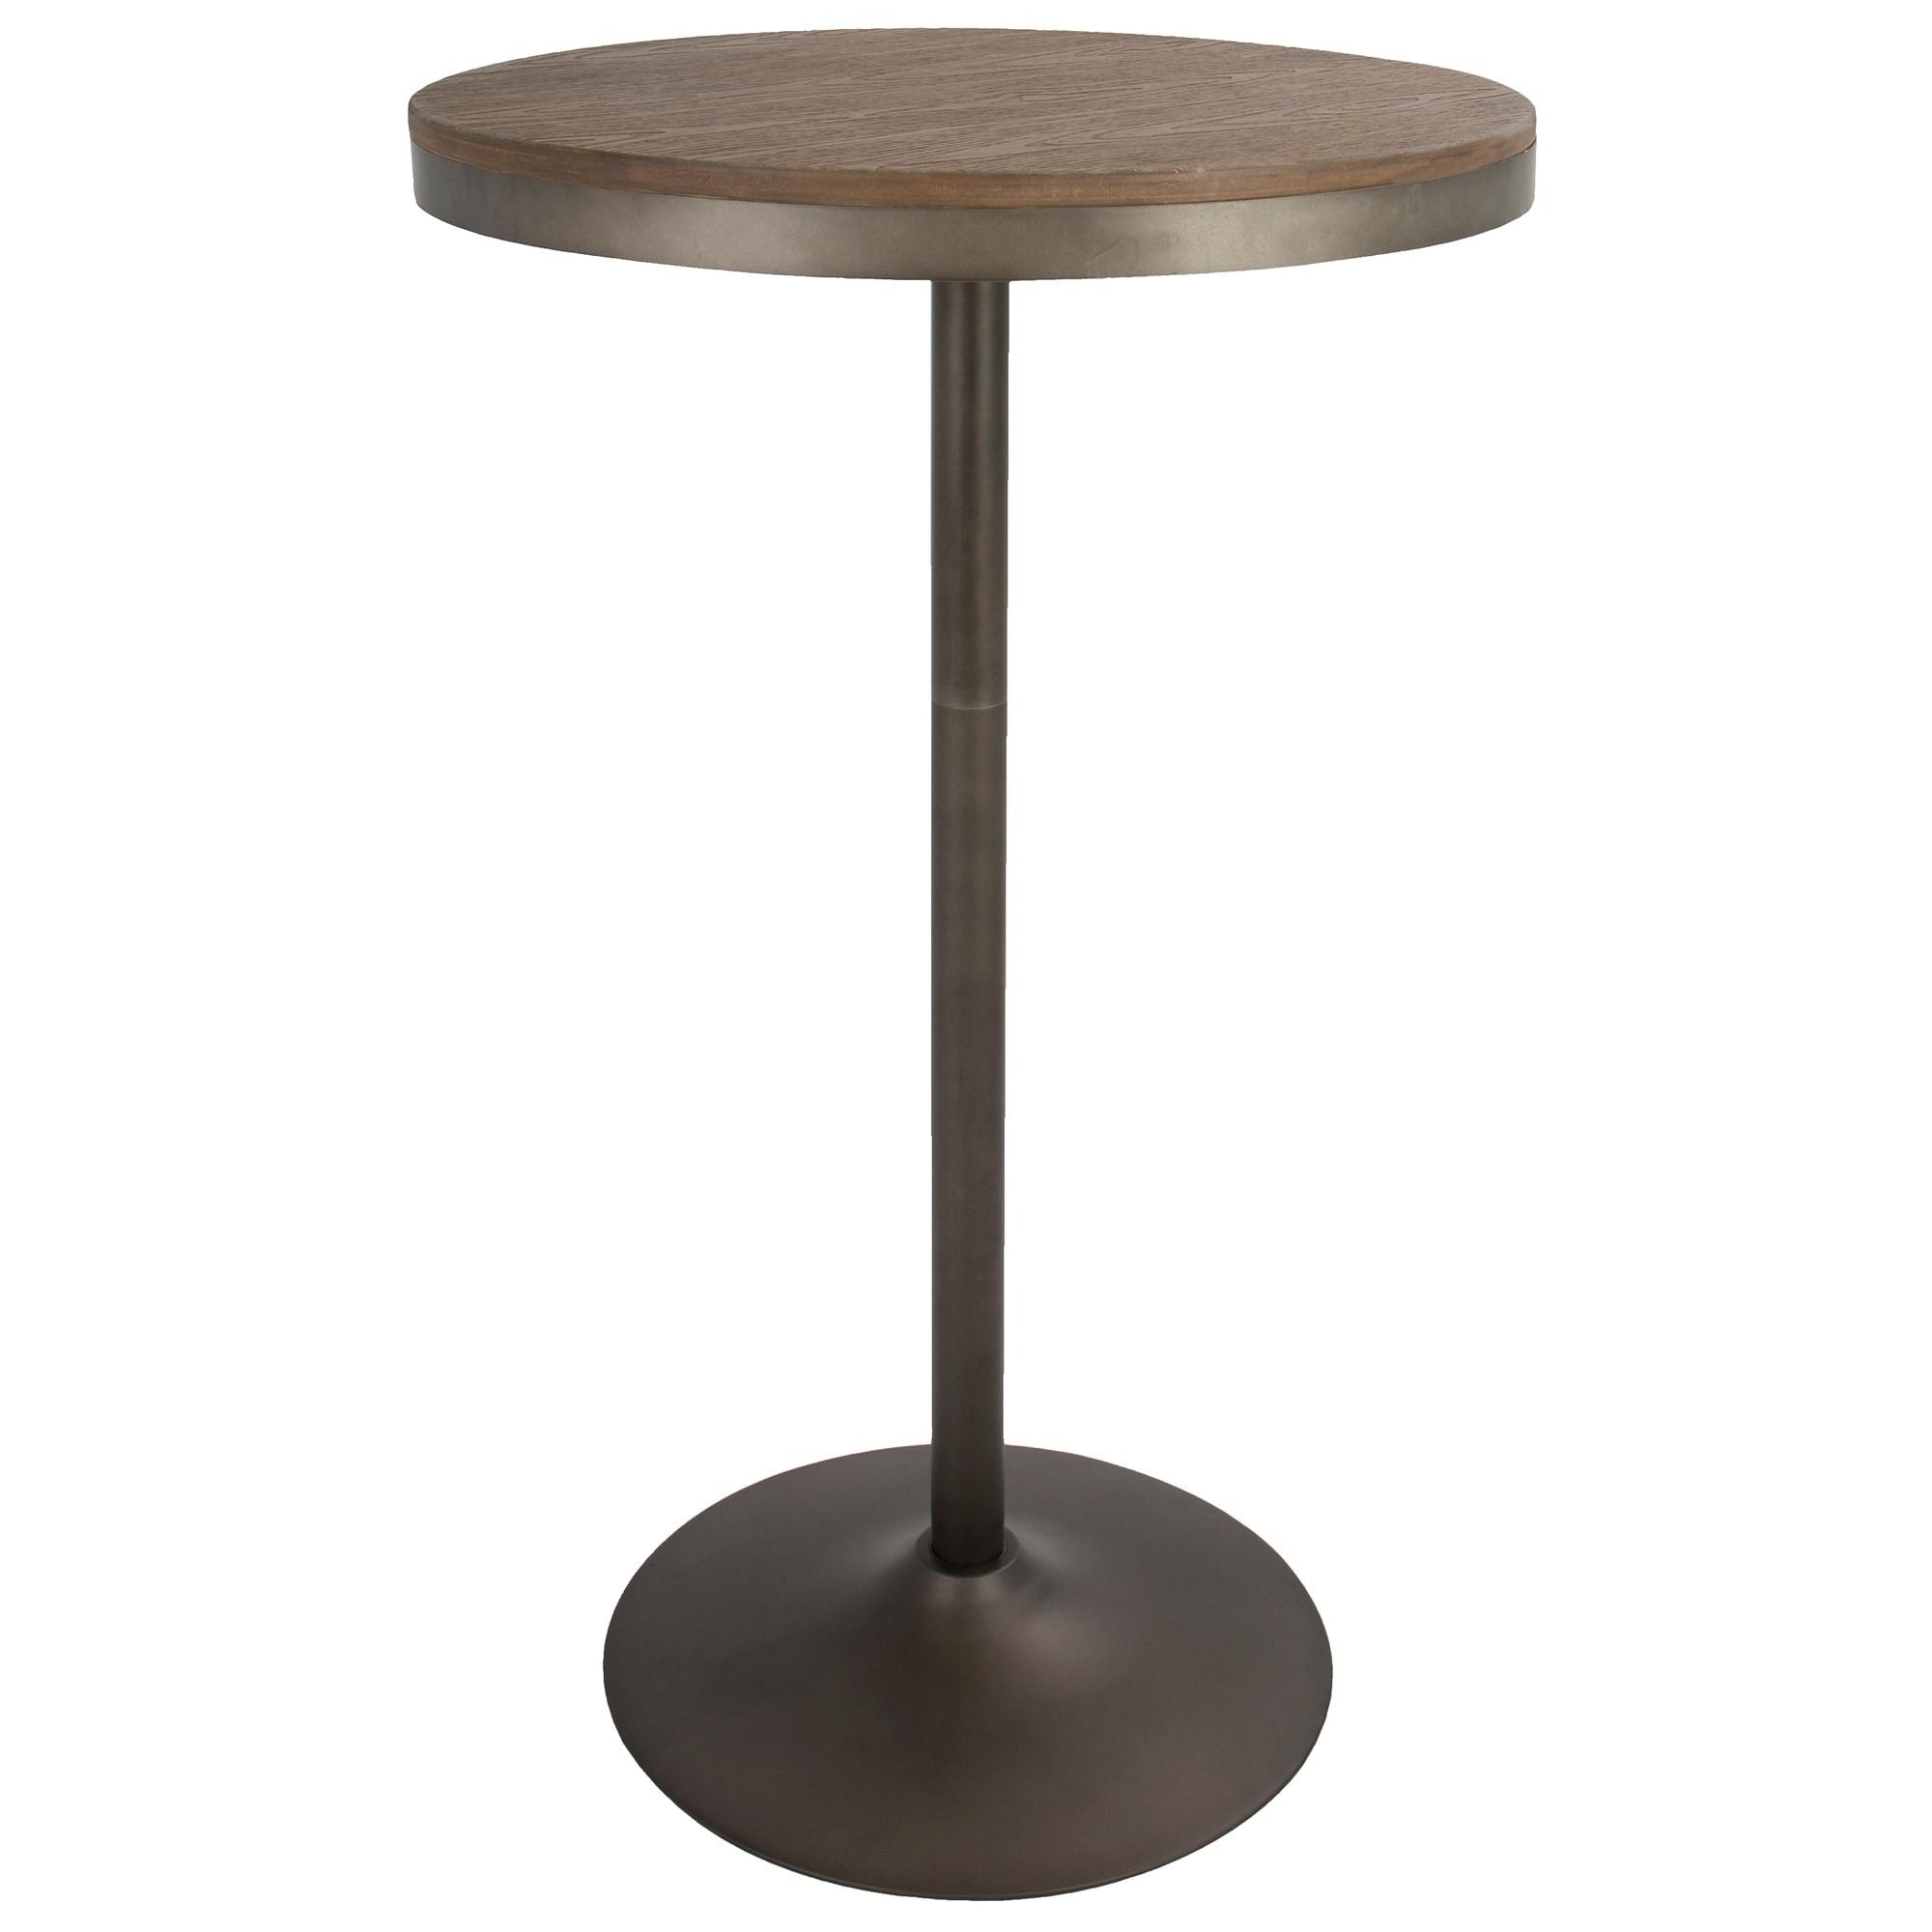 Bar Pub Tables Online At Our Best Dining Room Furniture Deals